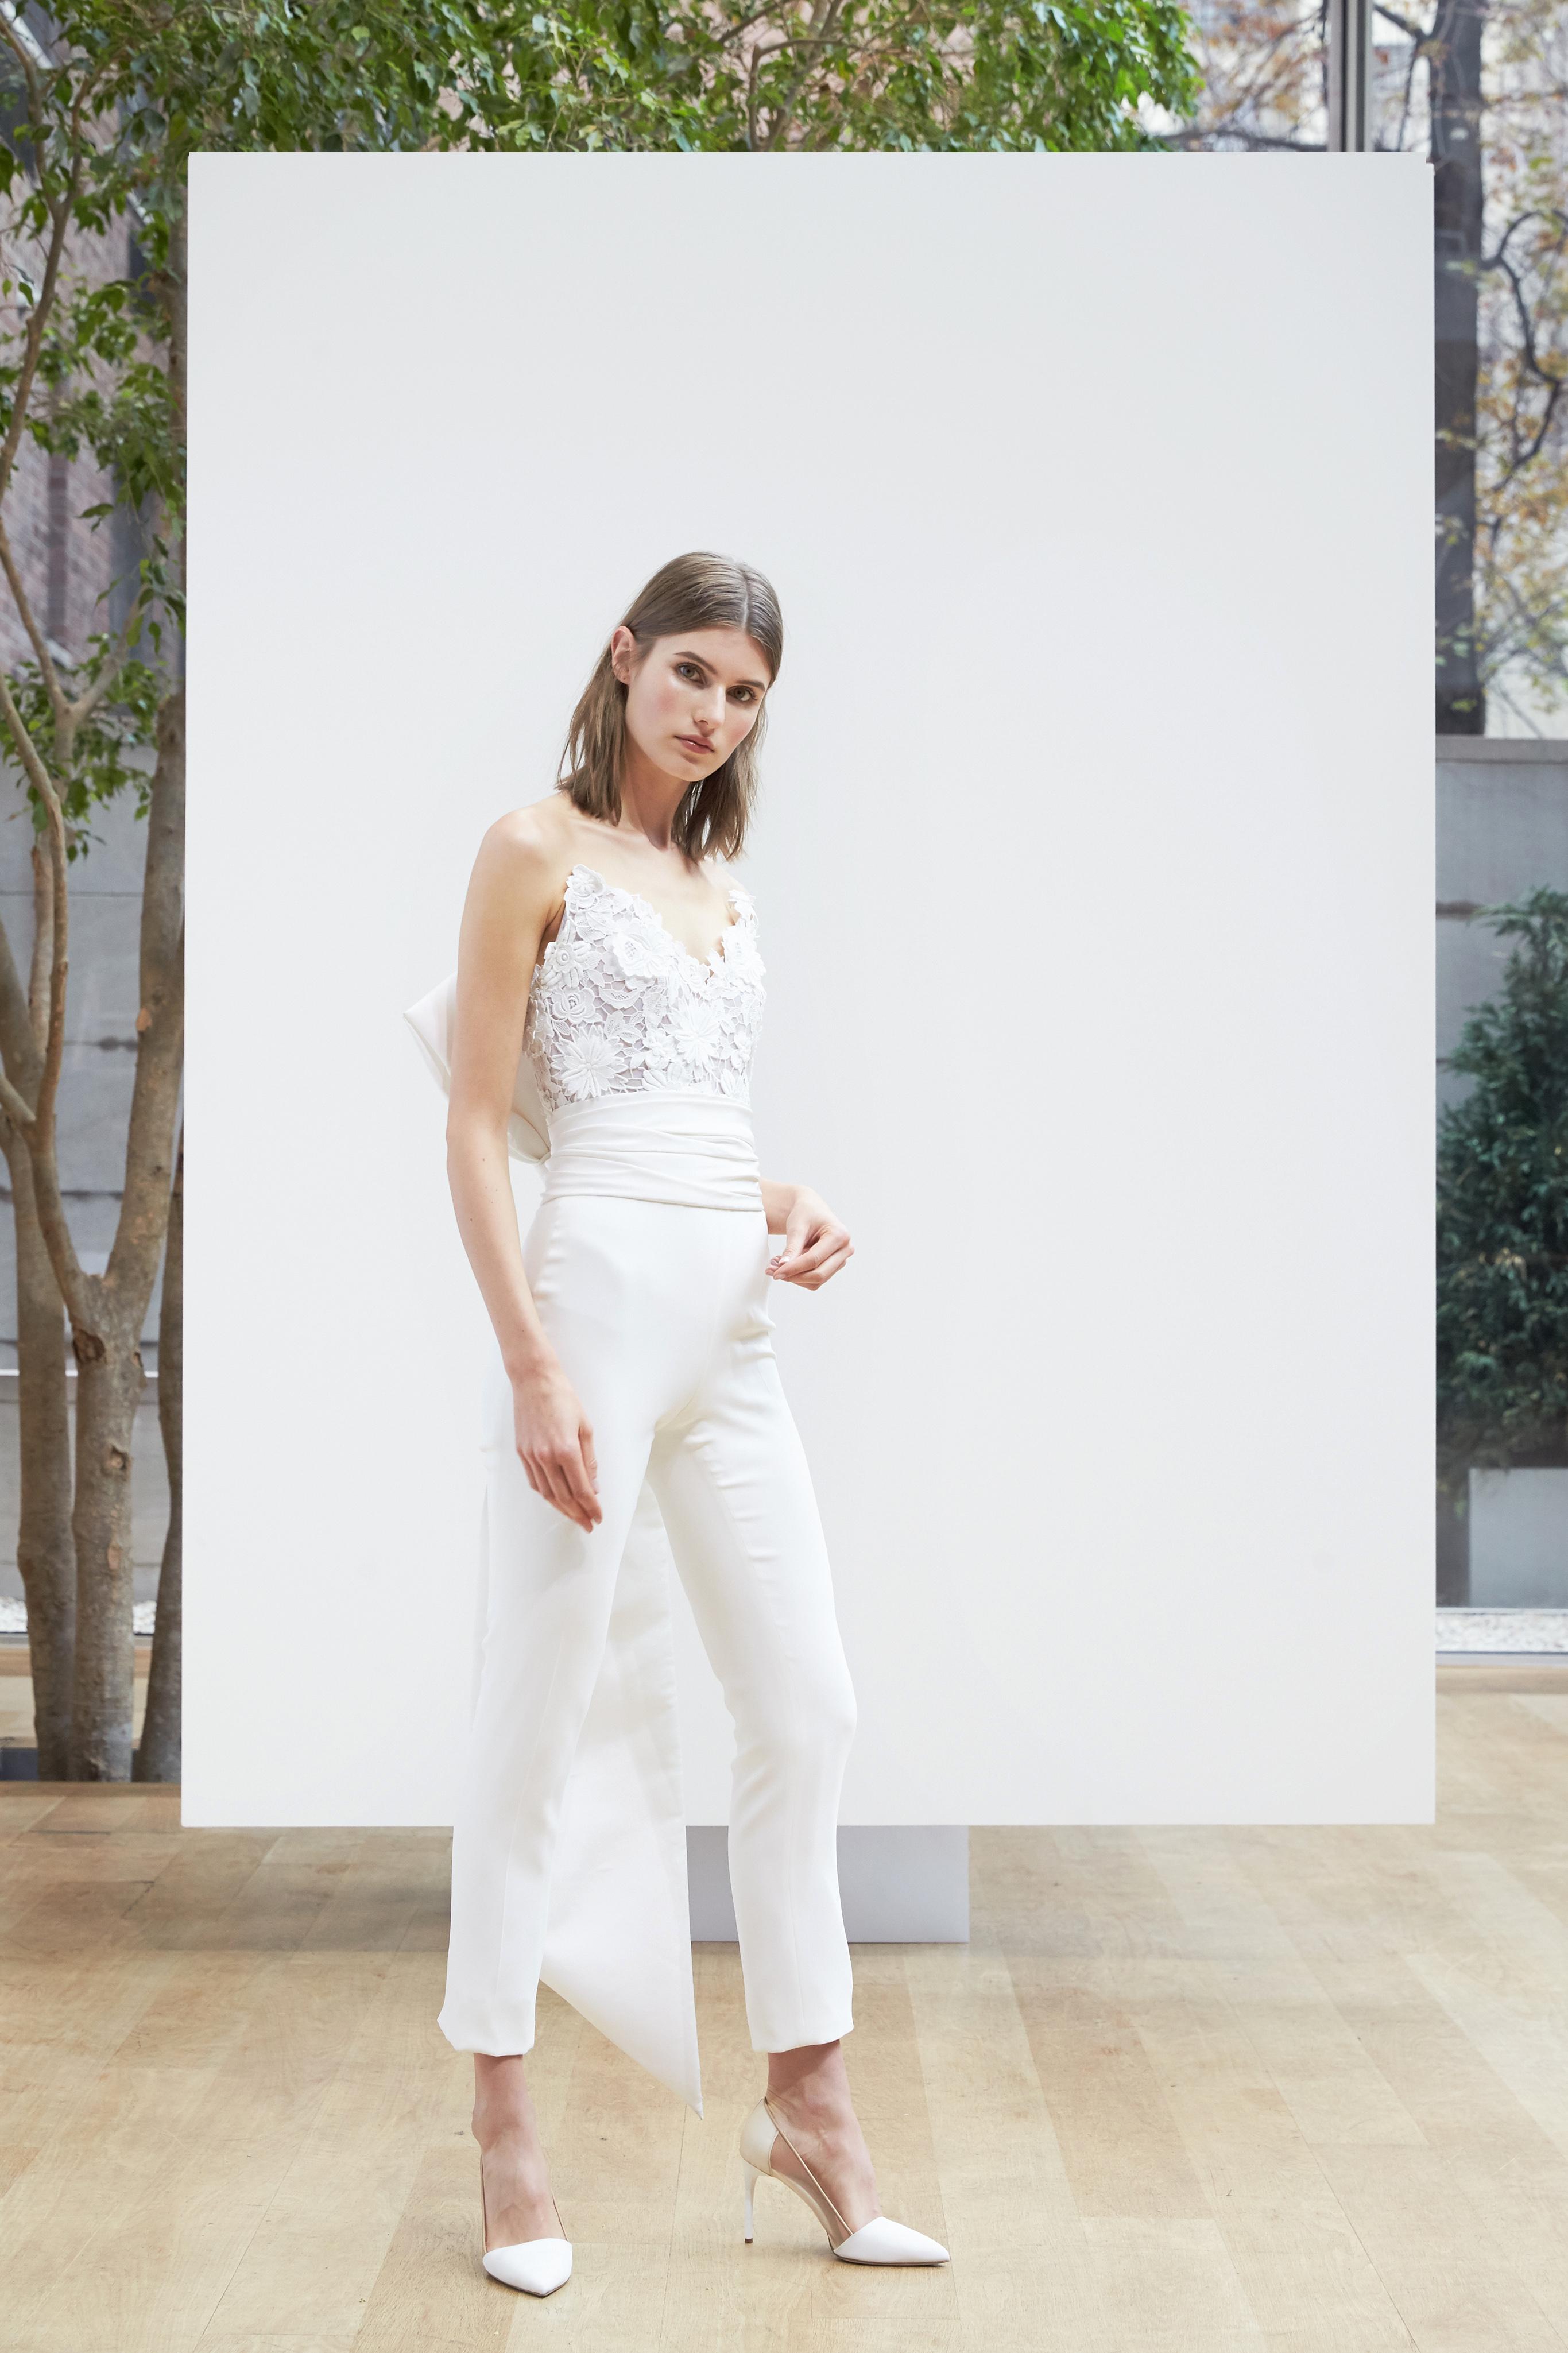 v-neck pant suit Oscar de la Renta Spring 2018 Wedding Dress Collection